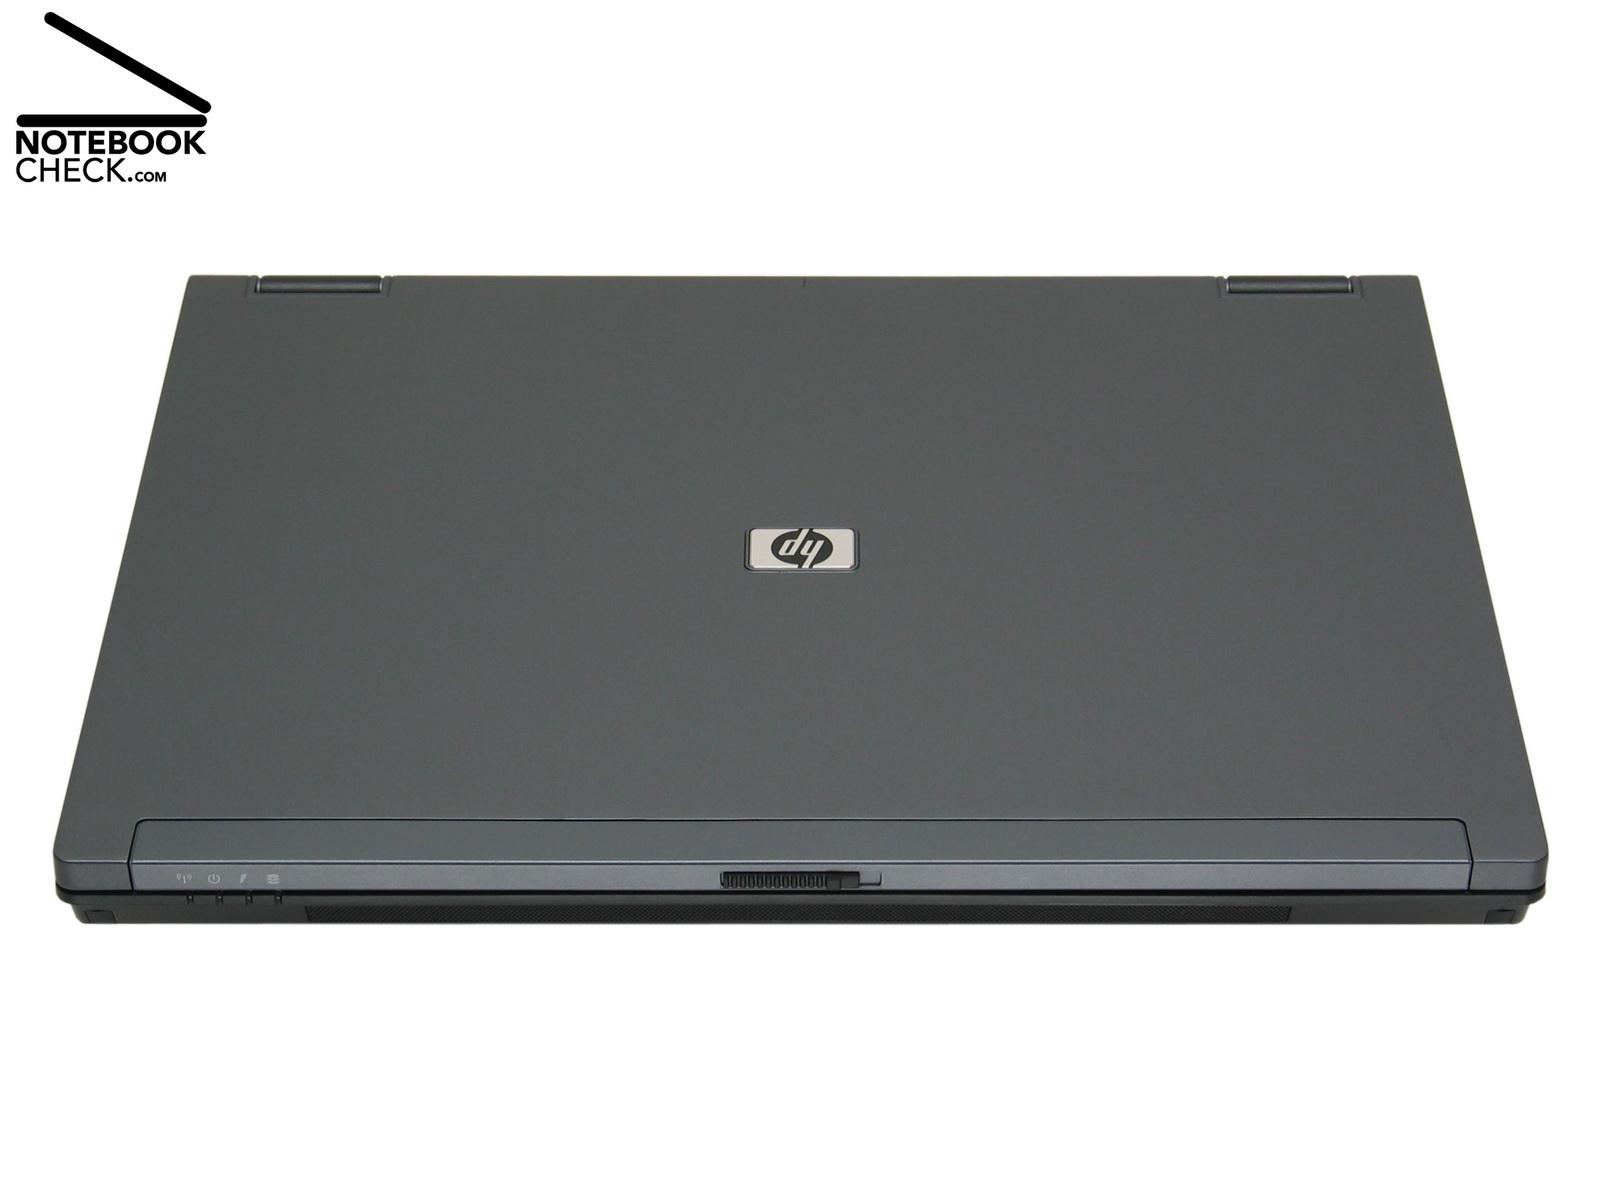 Test Hp Compaq 8510w Notebook Notebookcheck Com Tests